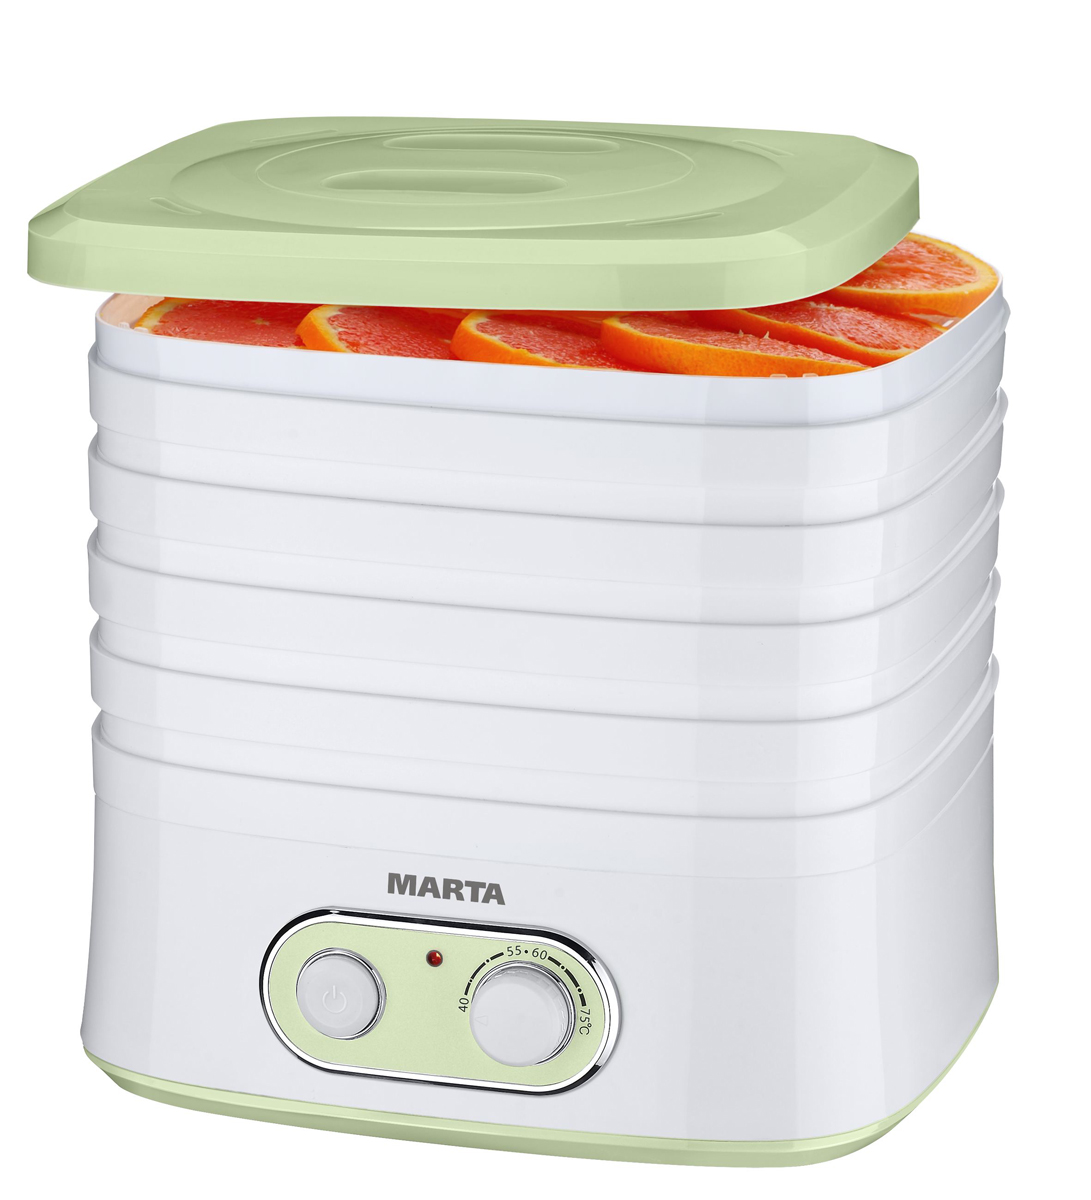 Marta MT-1945, Green Jade сушилка для фруктов и овощей - Техника для хранения, консервации и заготовок